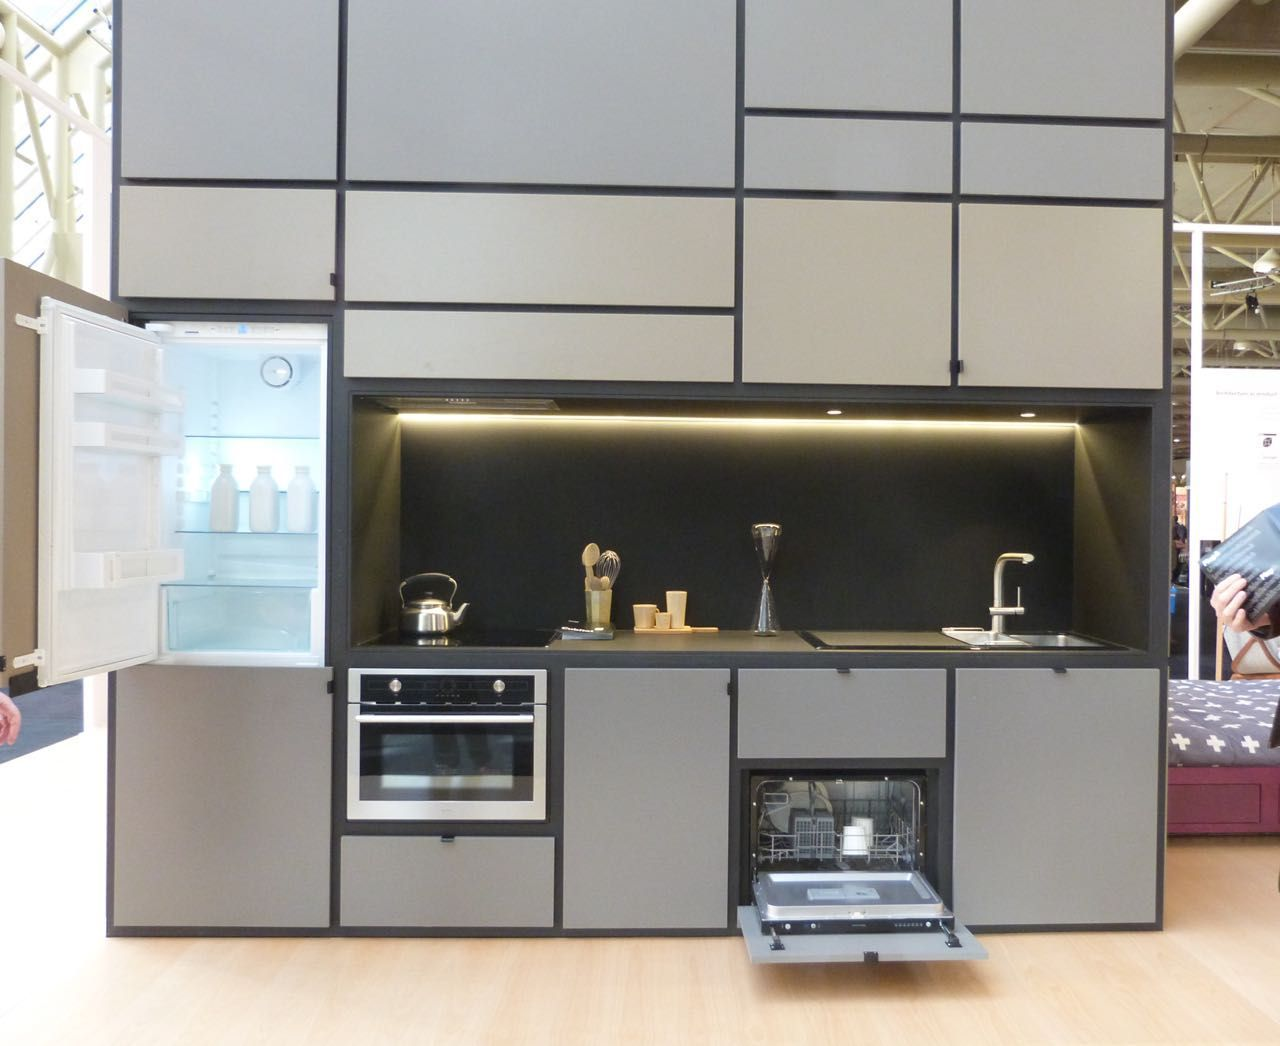 Kitchen cubitat photo